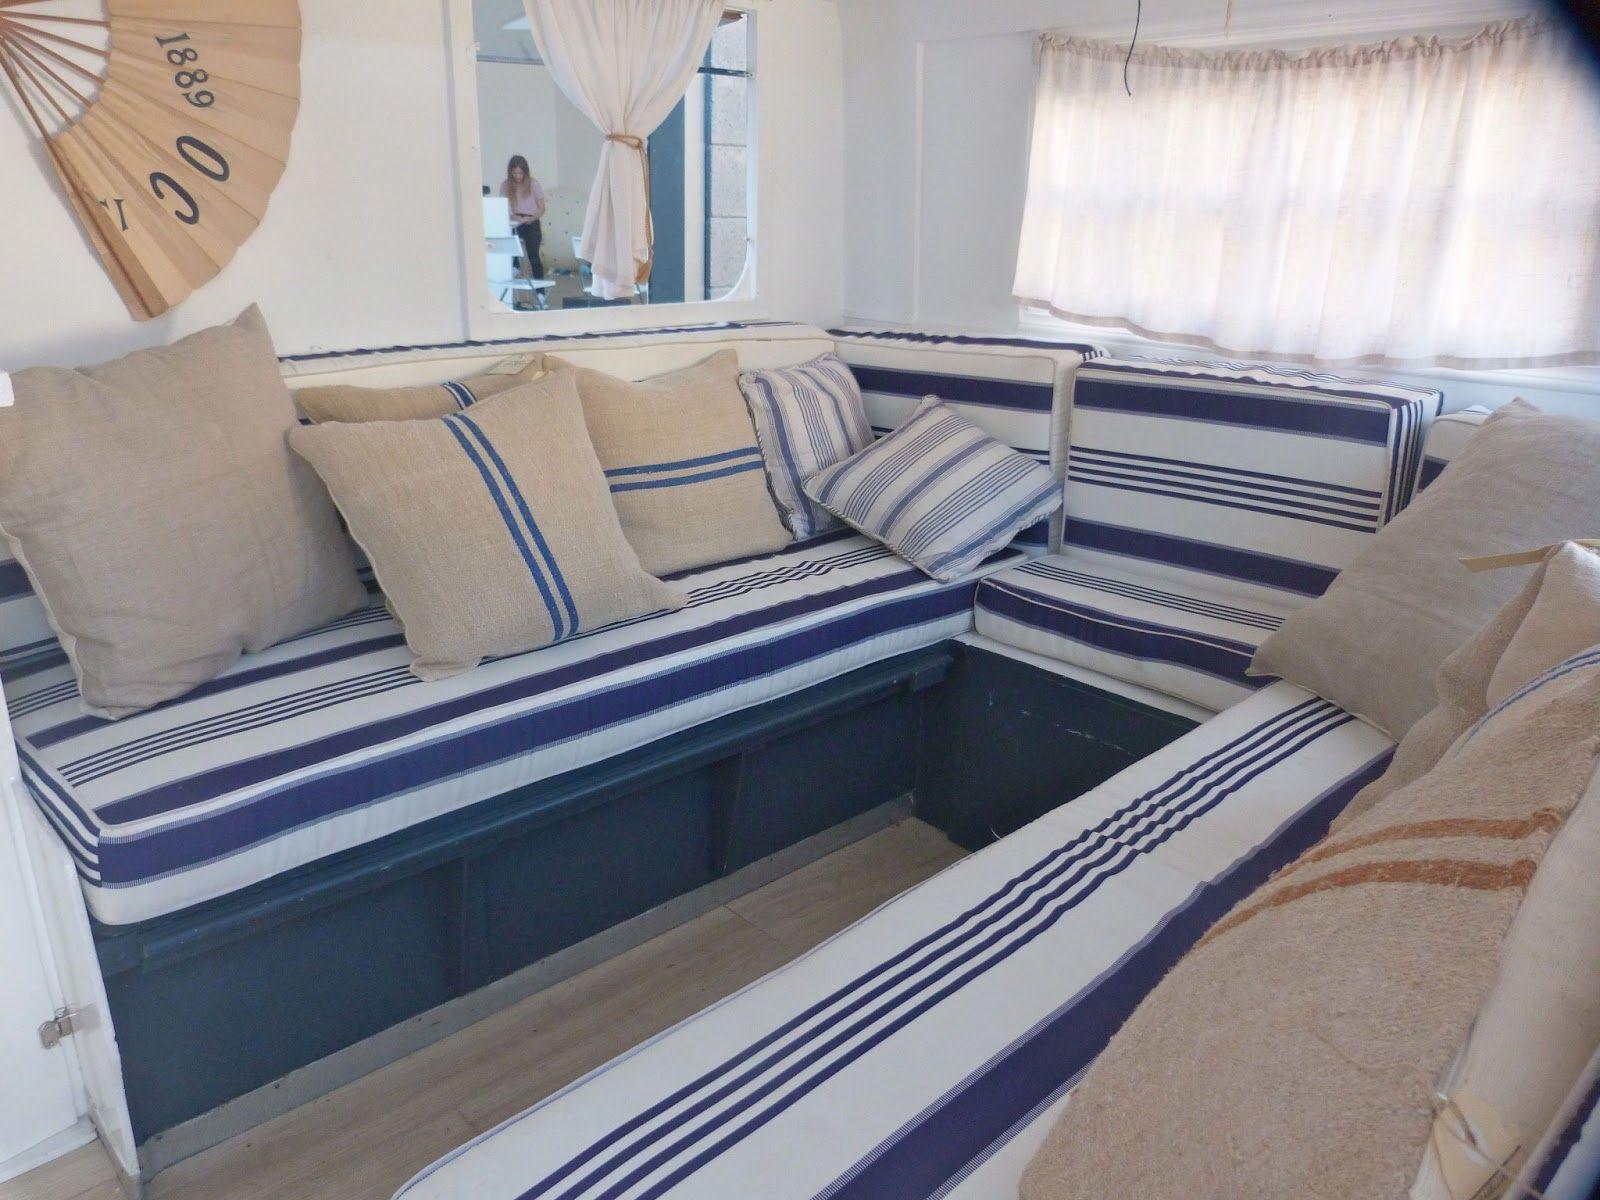 Idee Per Interni Roulotte : Kara rosenlunds frankie caravan interior.. one day ill deck out an